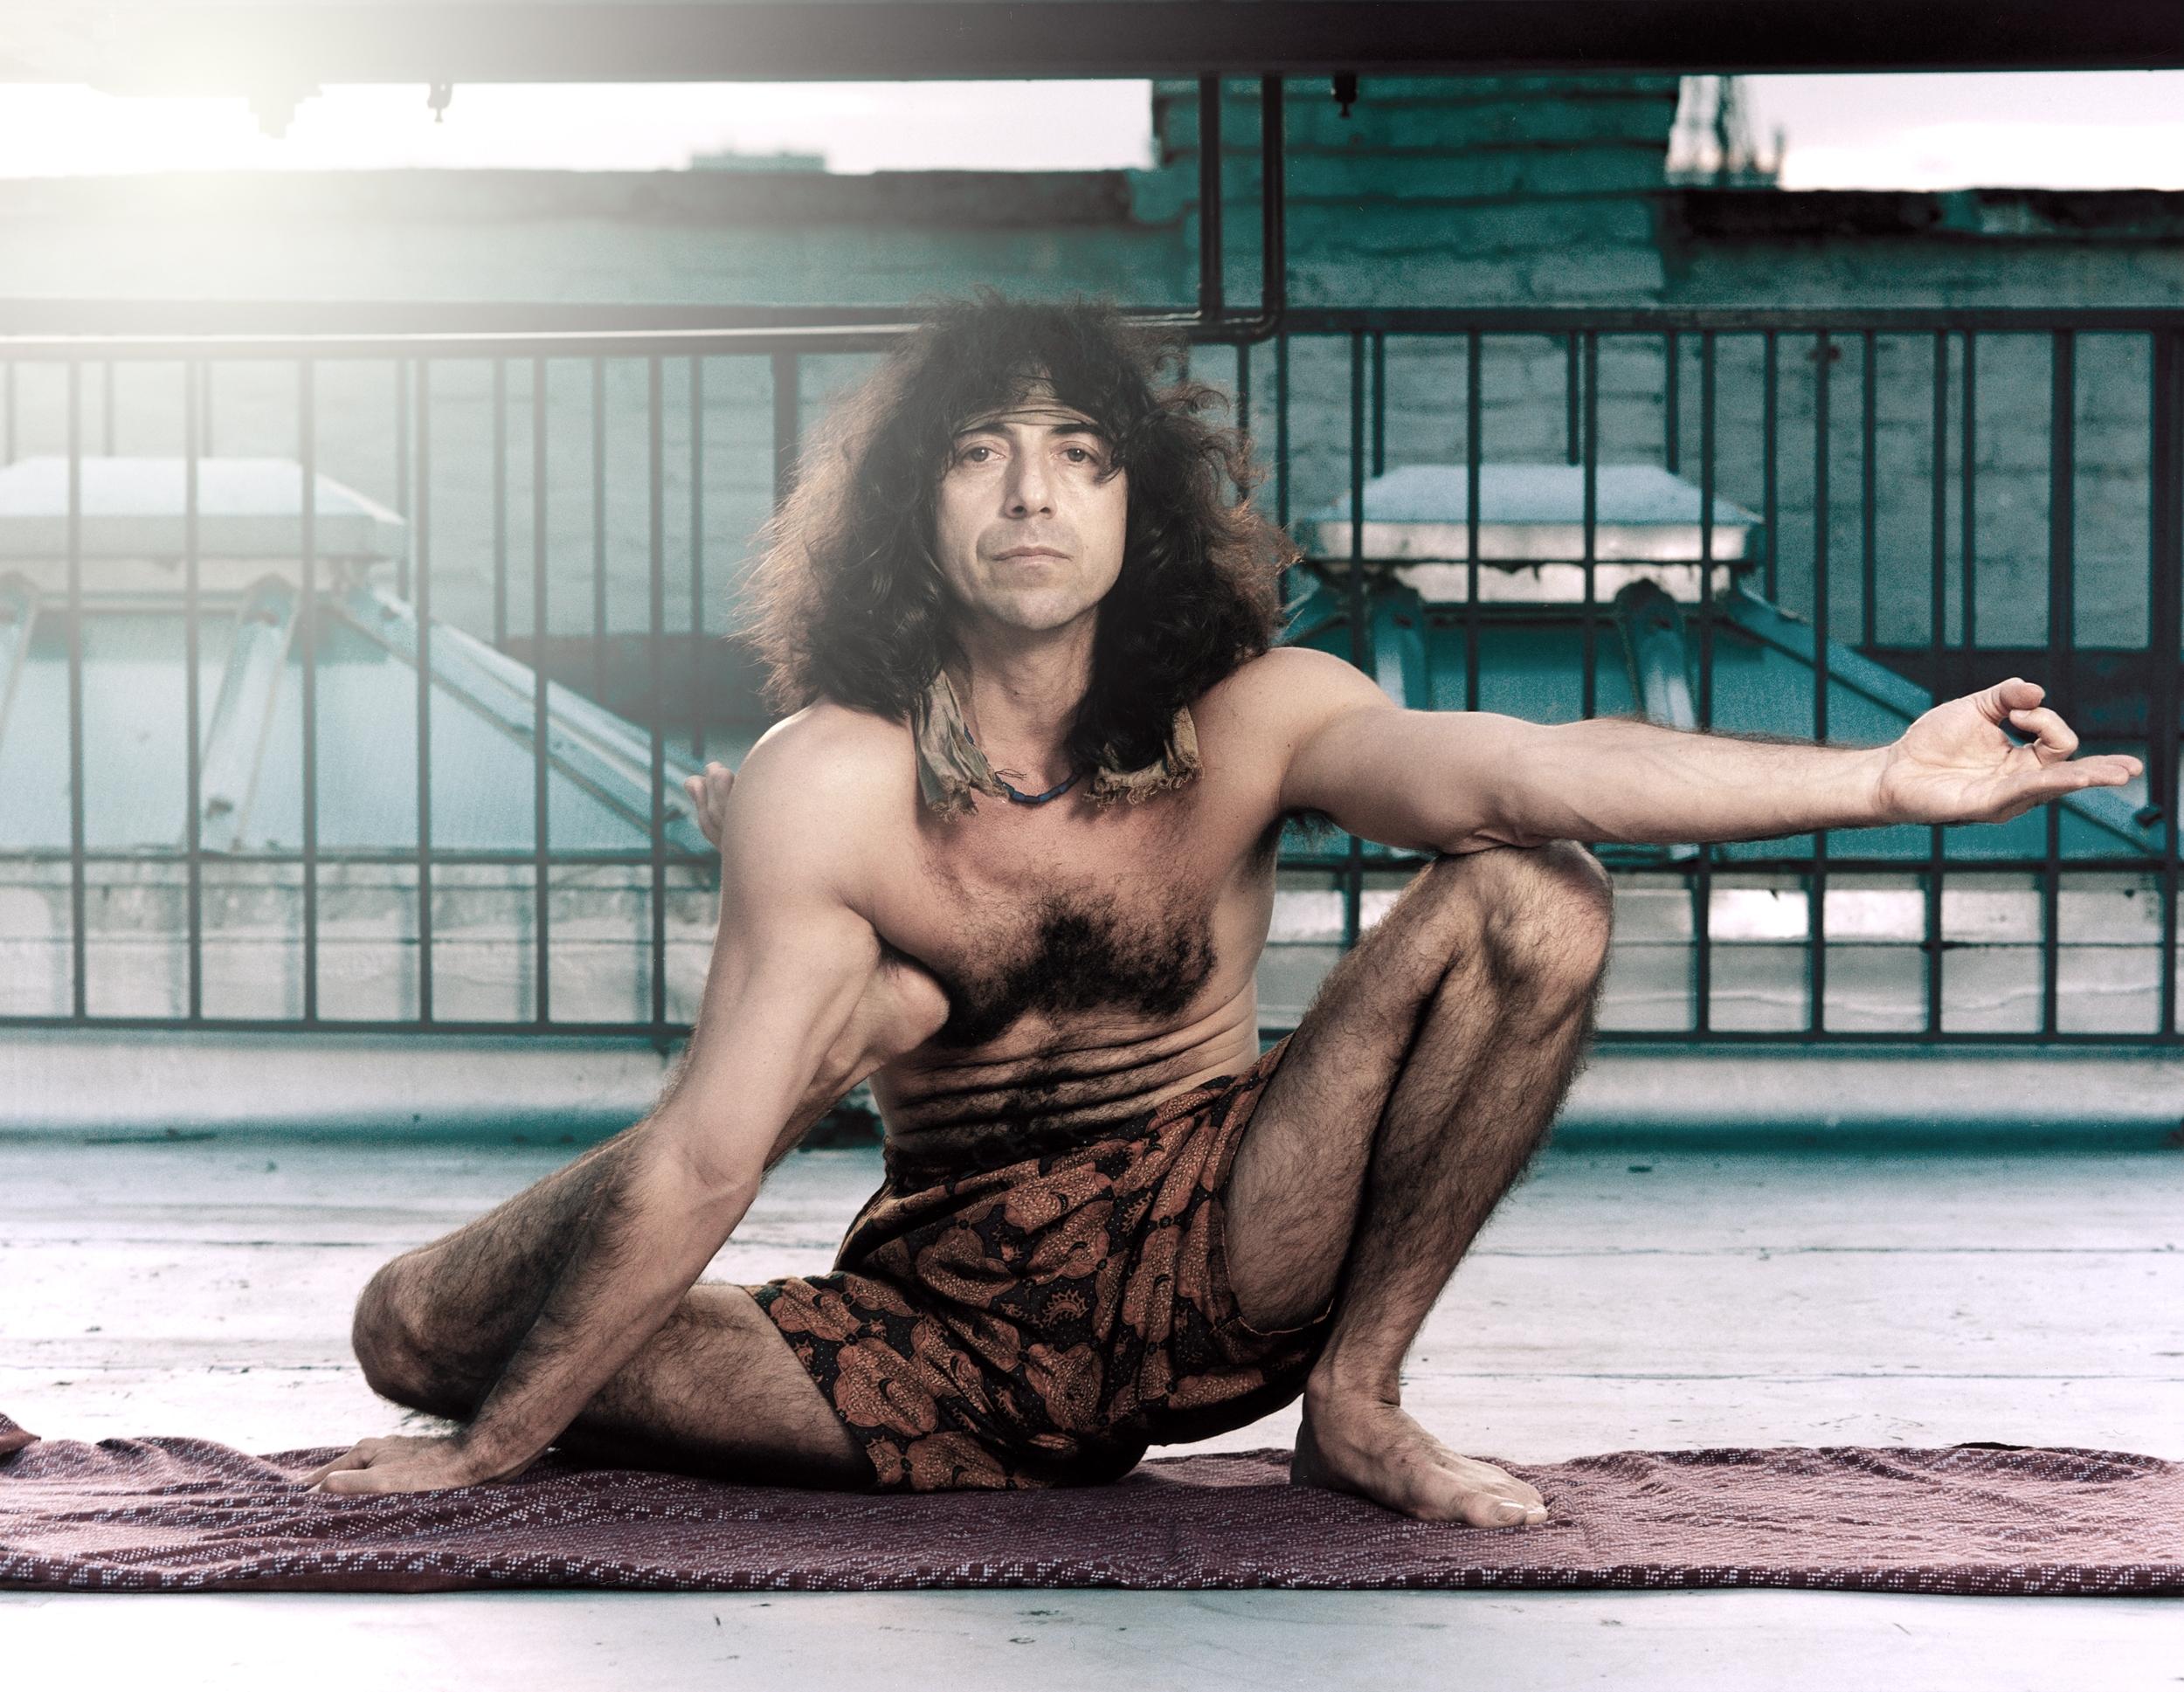 Yogadandasana. Danny Paradise New York 1999 Ashtanga Yoga photo by Kia Naddermier